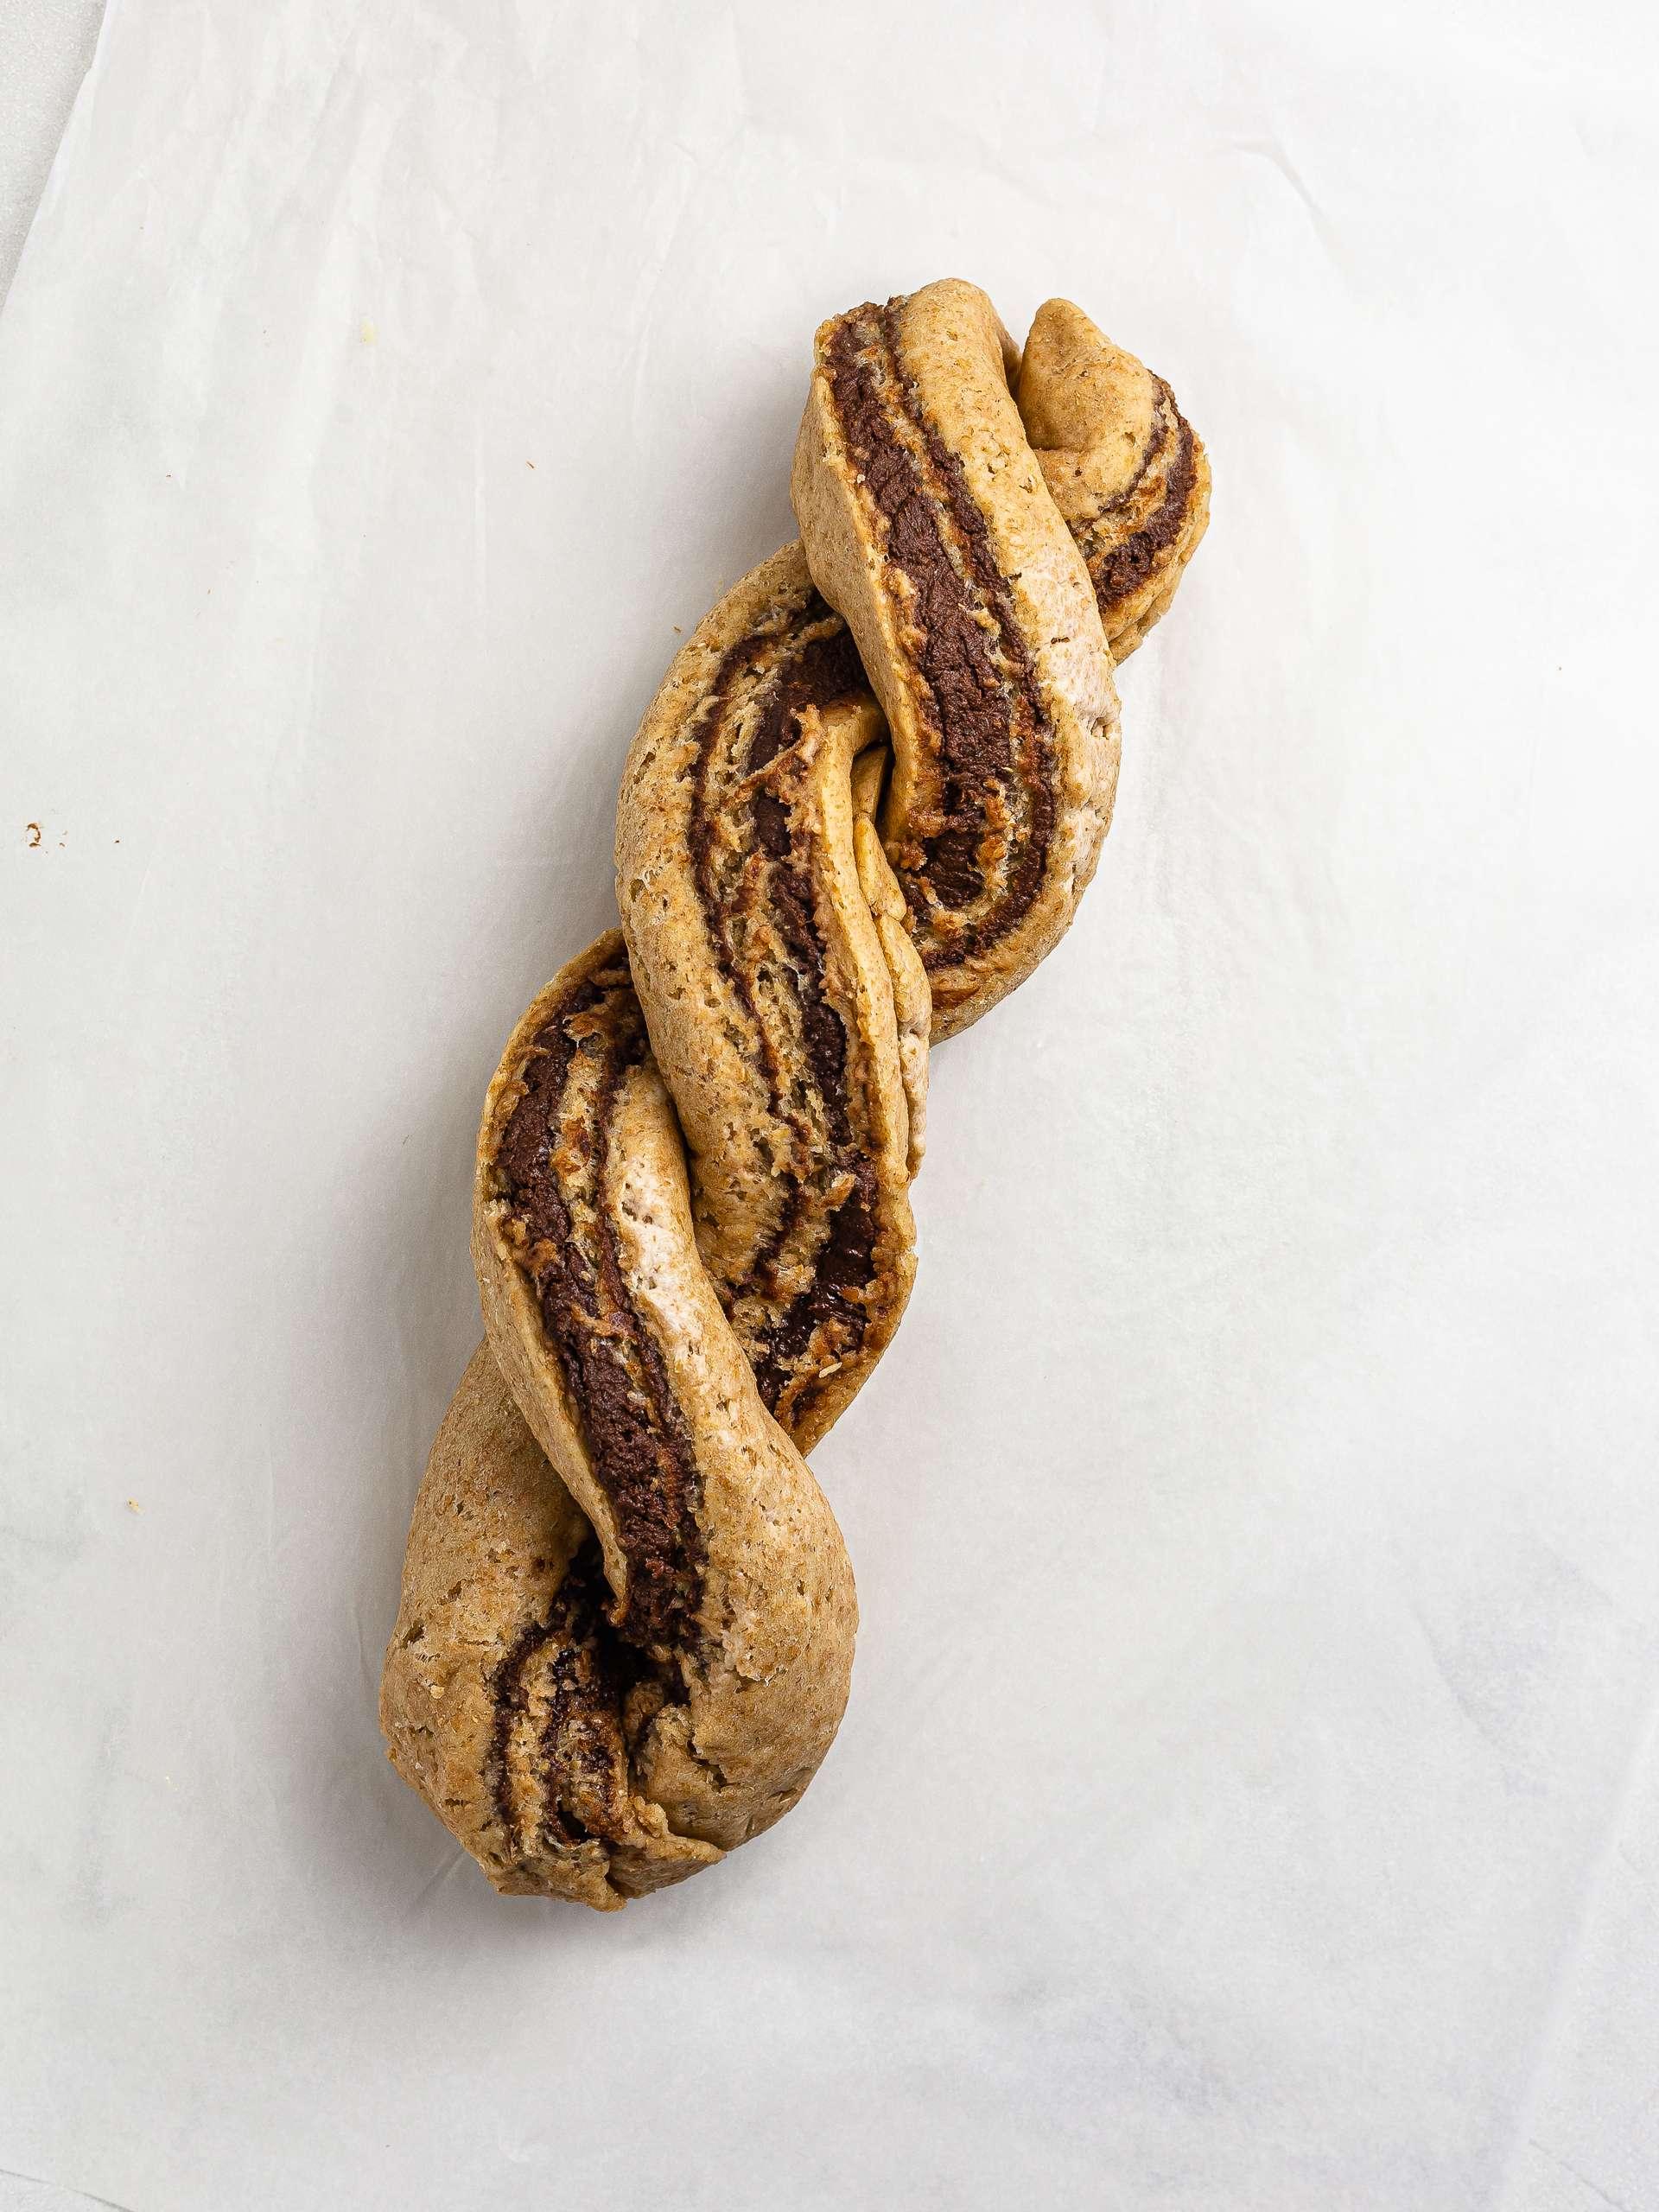 krantz cake shaped as twisted braid